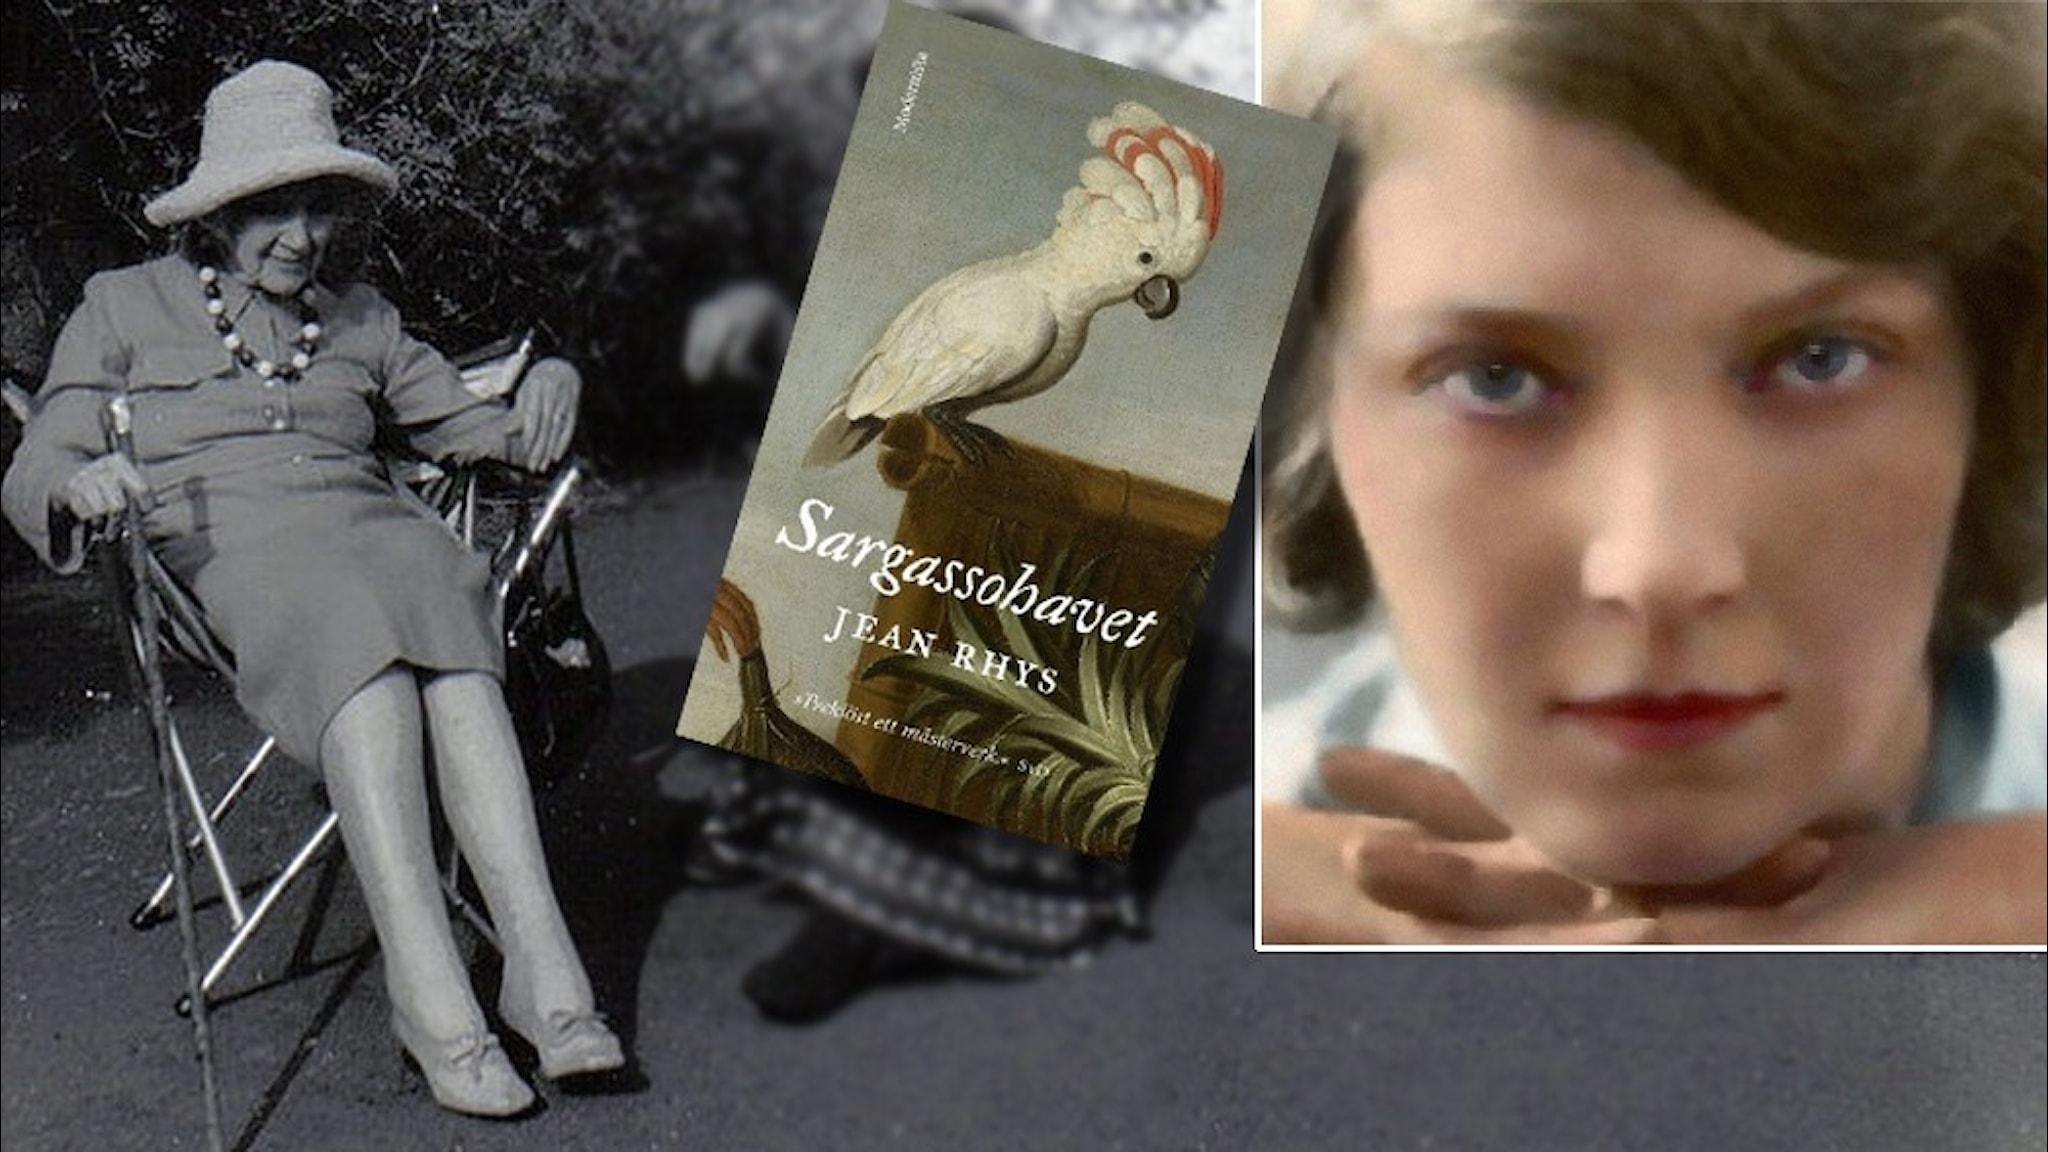 Jean Rhys 1890-1979